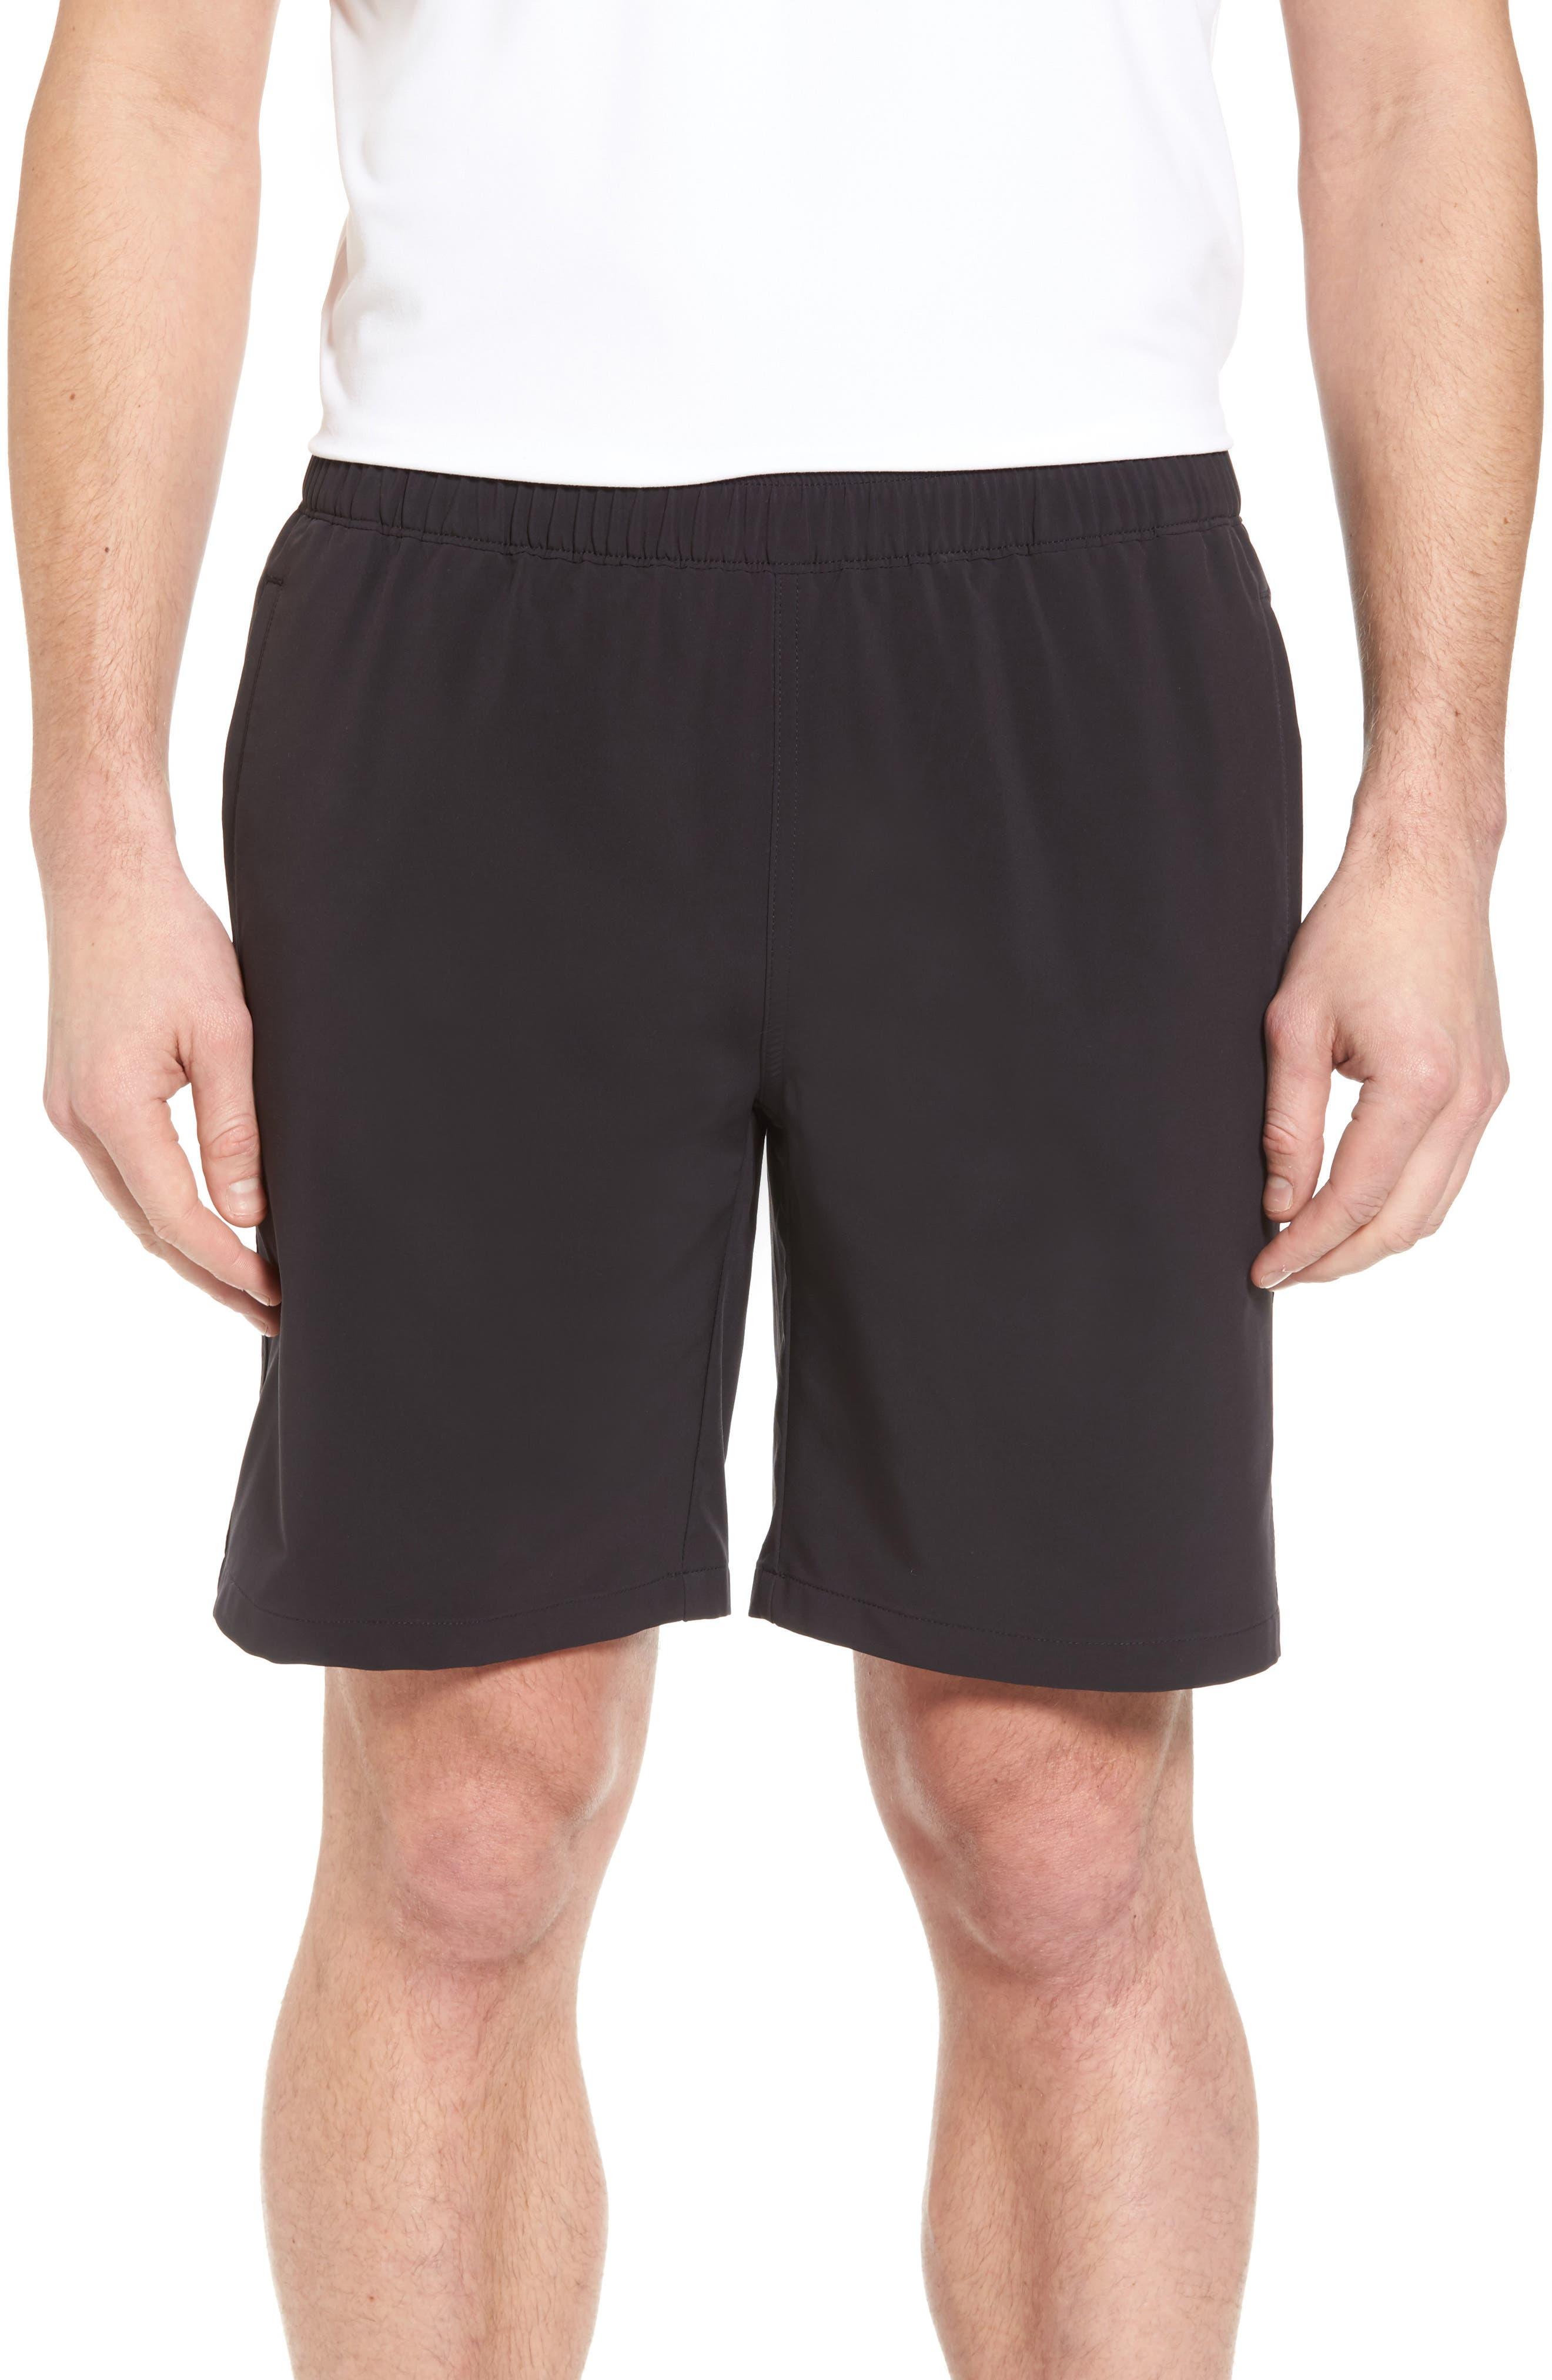 Oslo Sport Shorts,                             Main thumbnail 1, color,                             Black